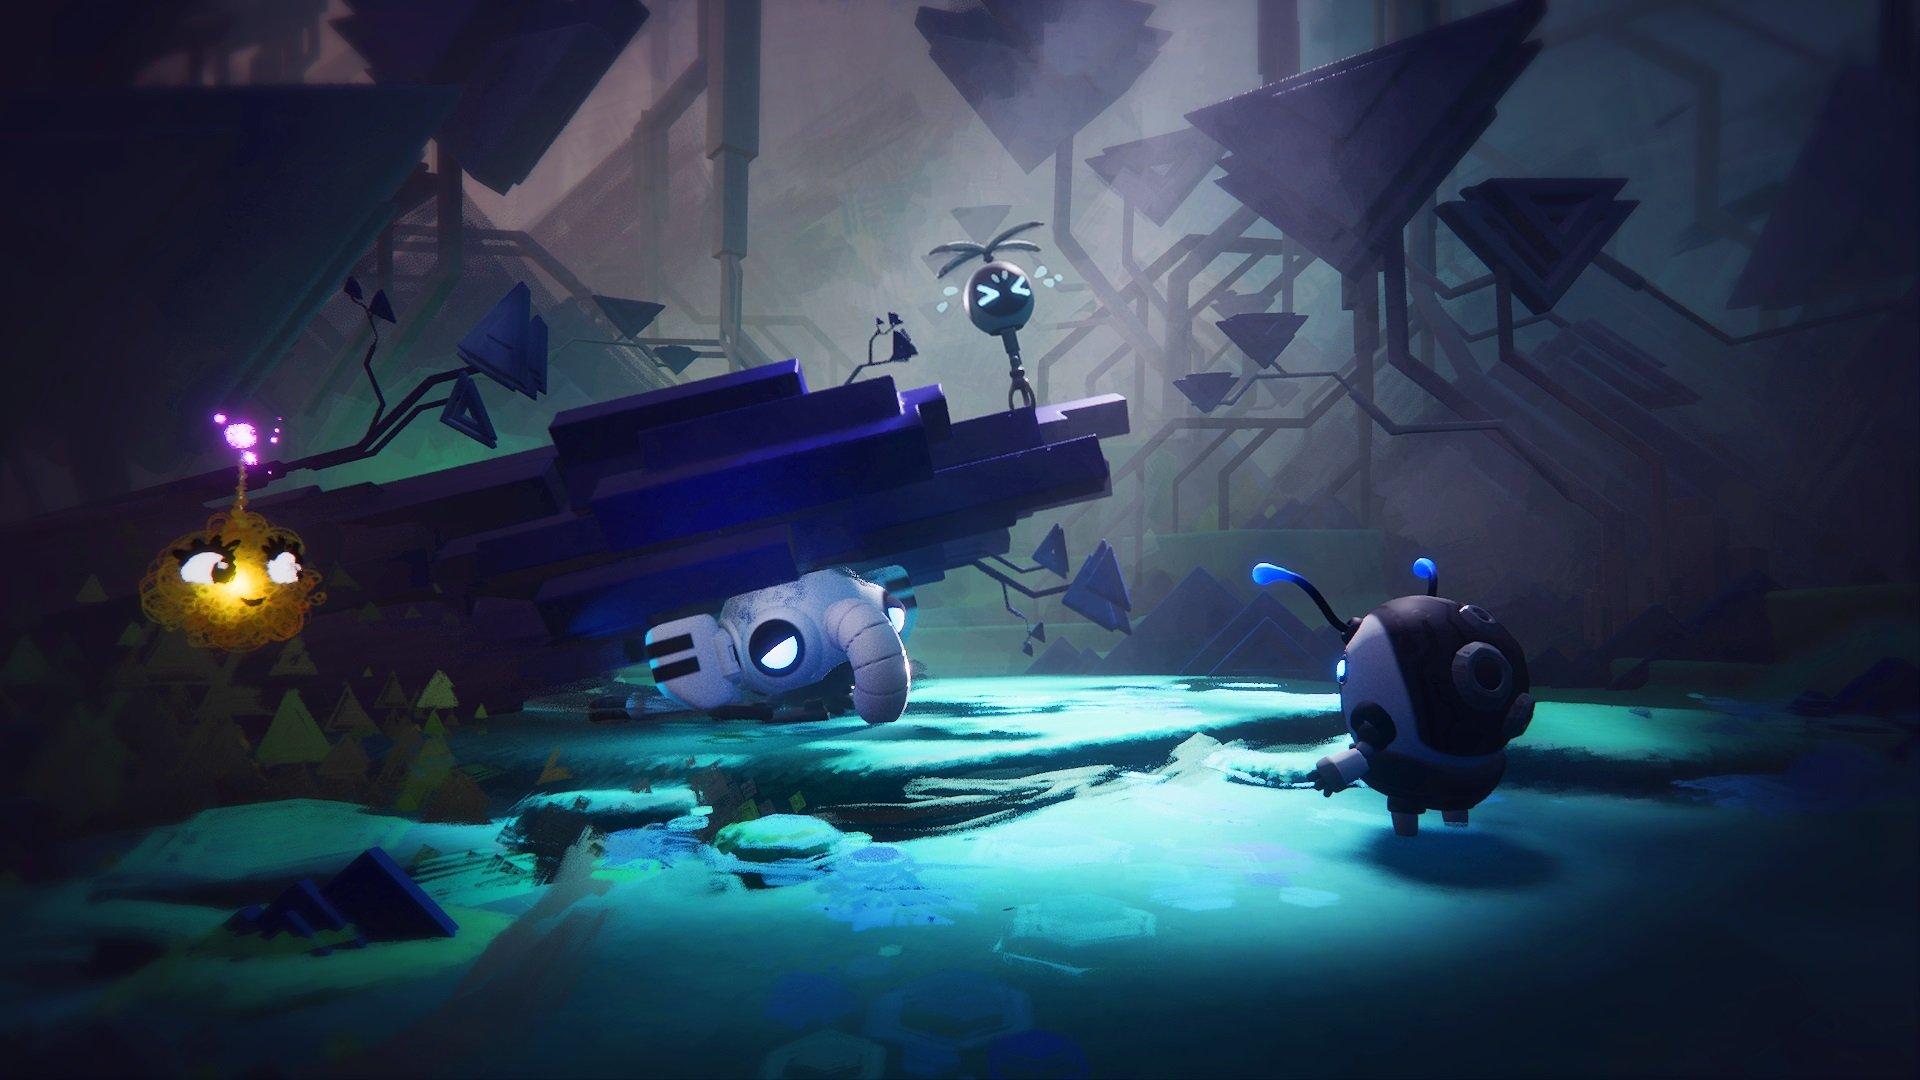 Dreams-PS4-PSX17-screenshot-11-Mystery